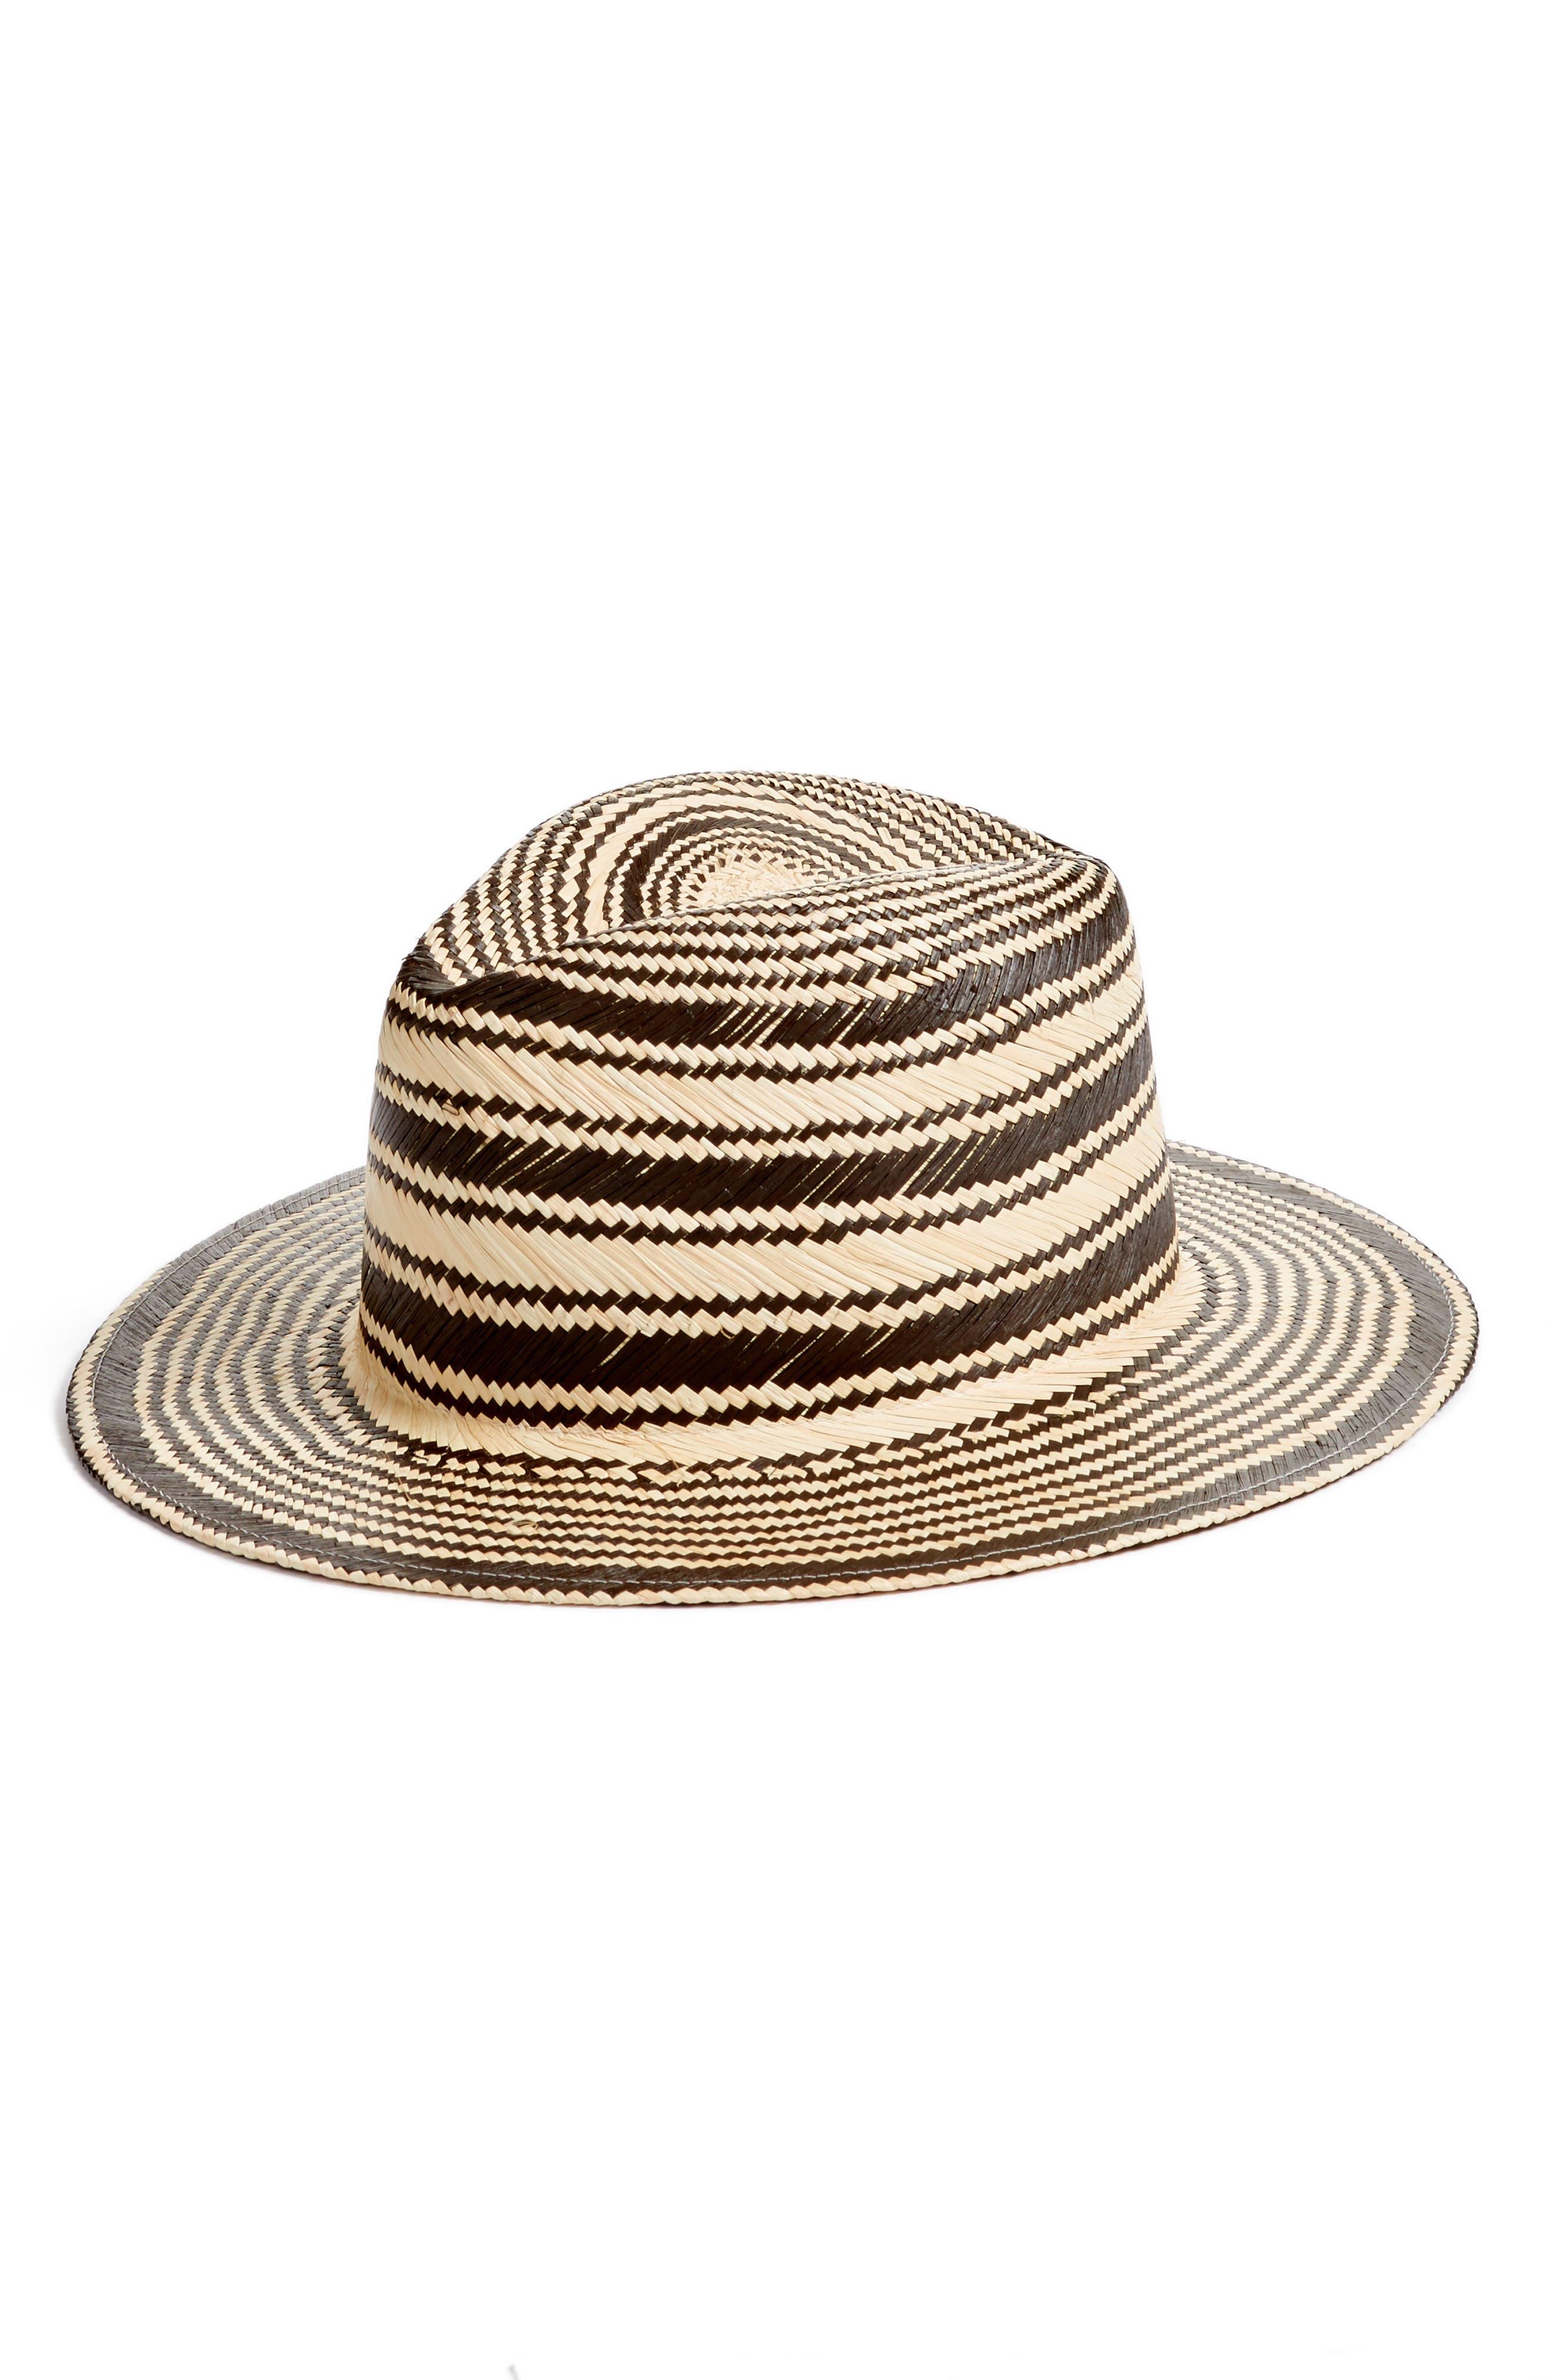 RAG & BONE, Stripe Panama Hat, Main thumbnail 1, color, 001